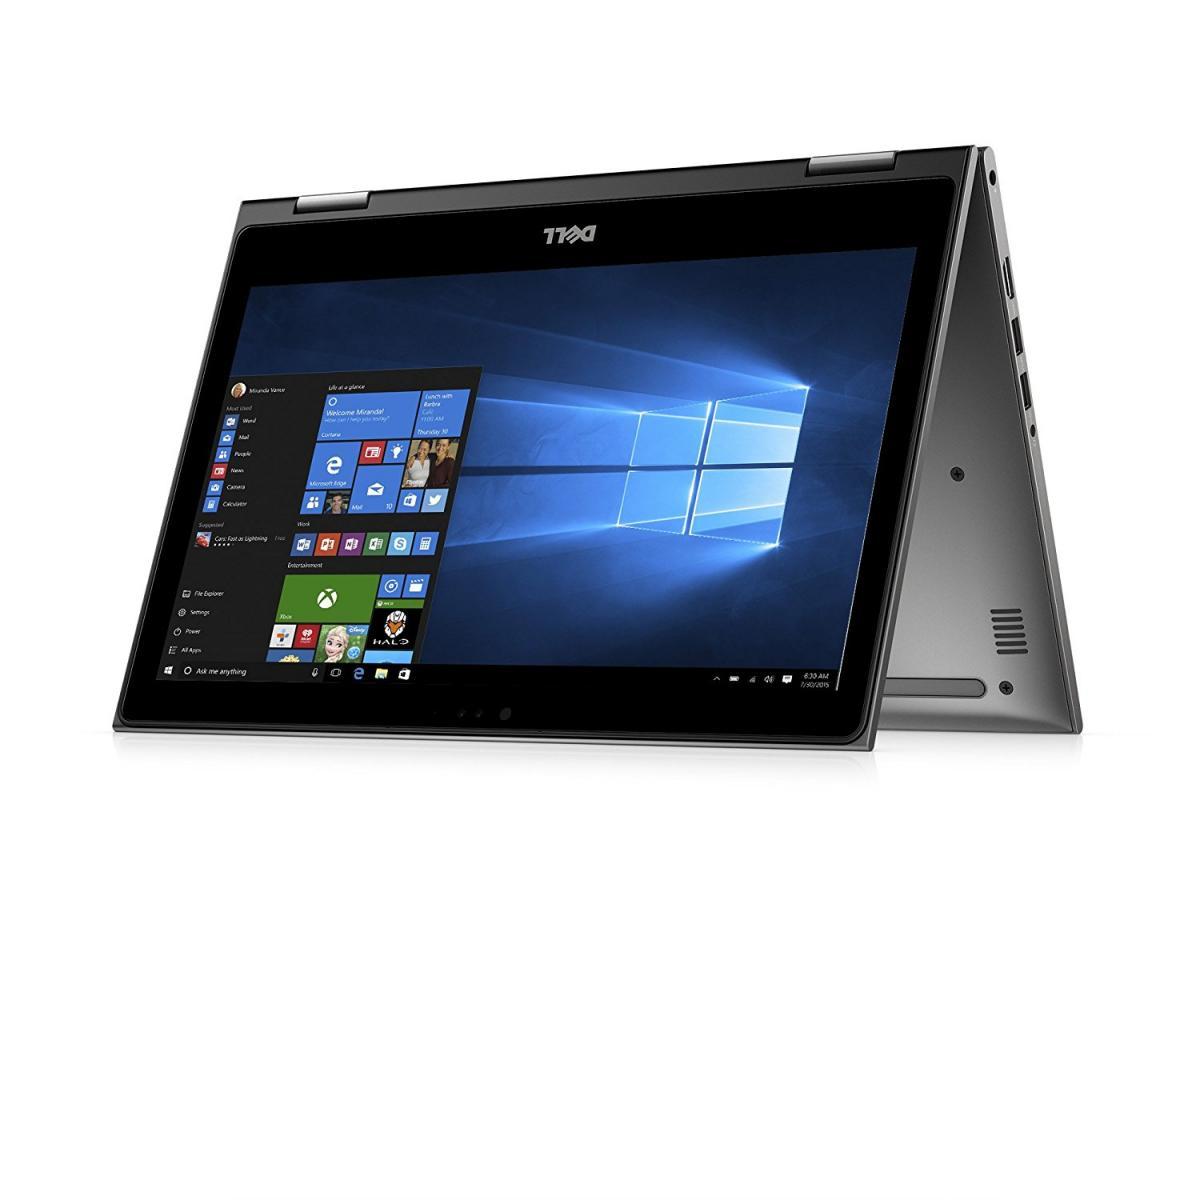 Dell Inspiron 13 5378 2 In 1 Core I5 Gts Amman Jordan